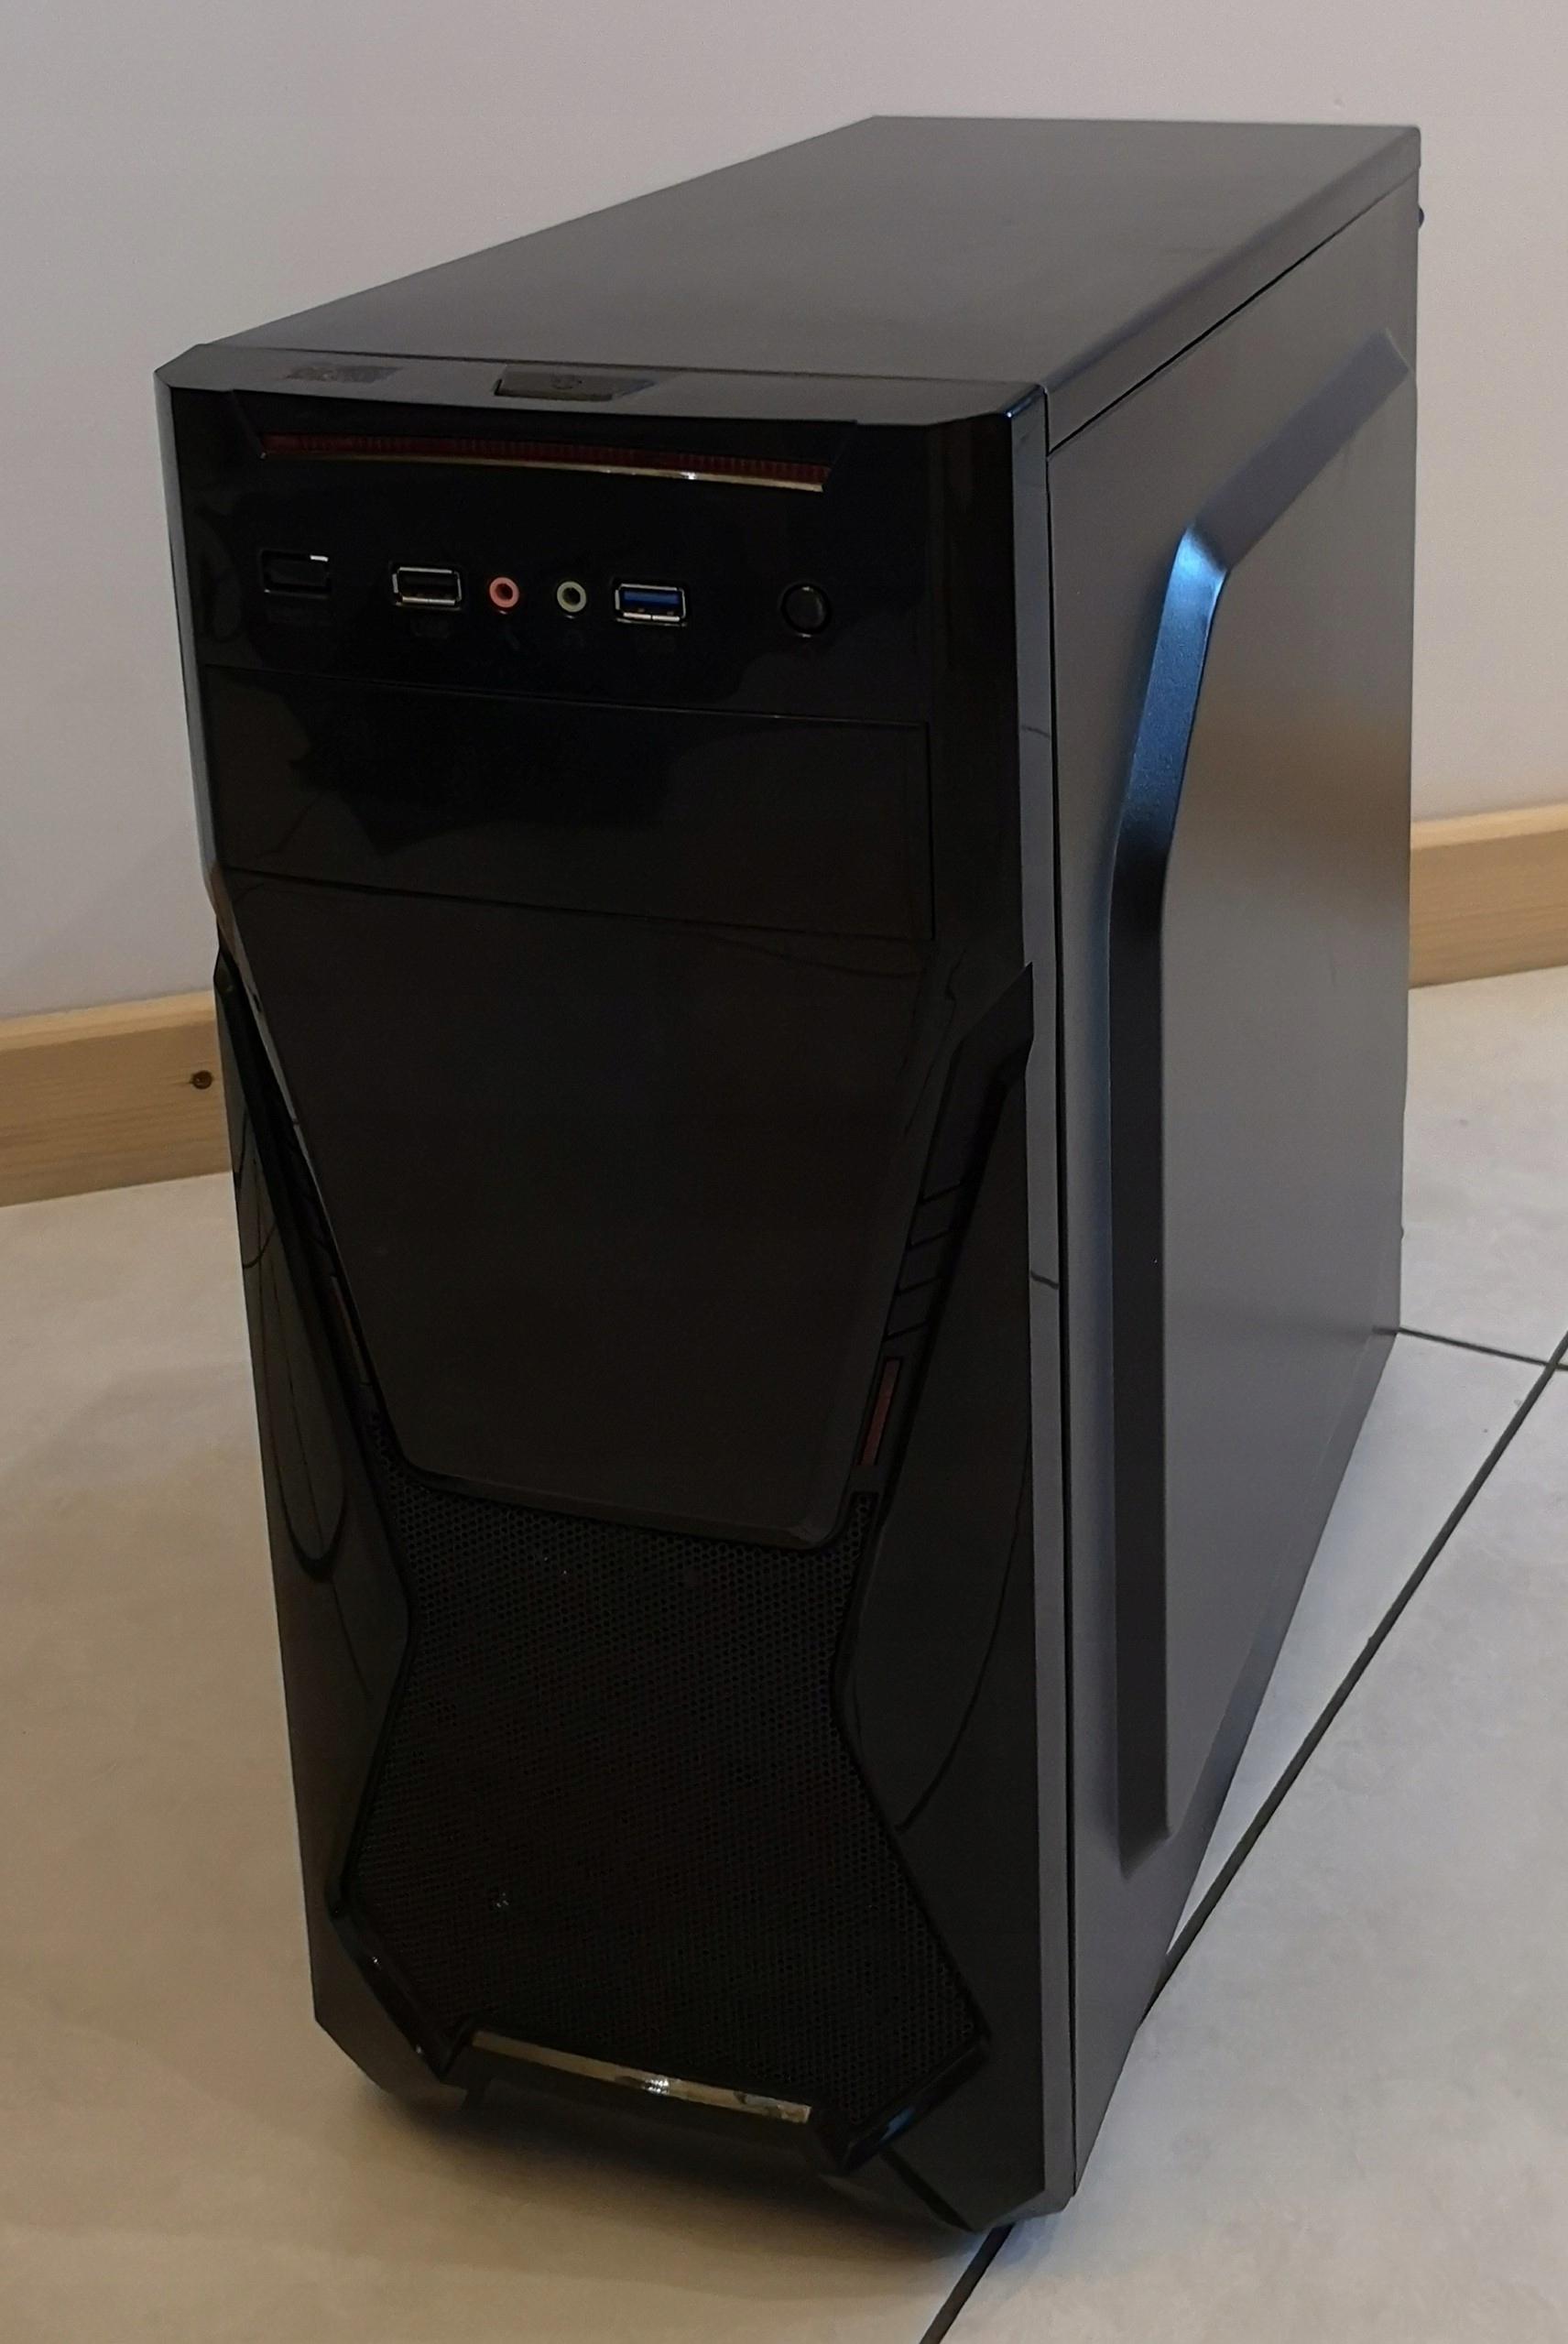 AMD FX 6350 6 rdzeni 3.9 GHz, 8 GB DDR3, GTX 750Ti